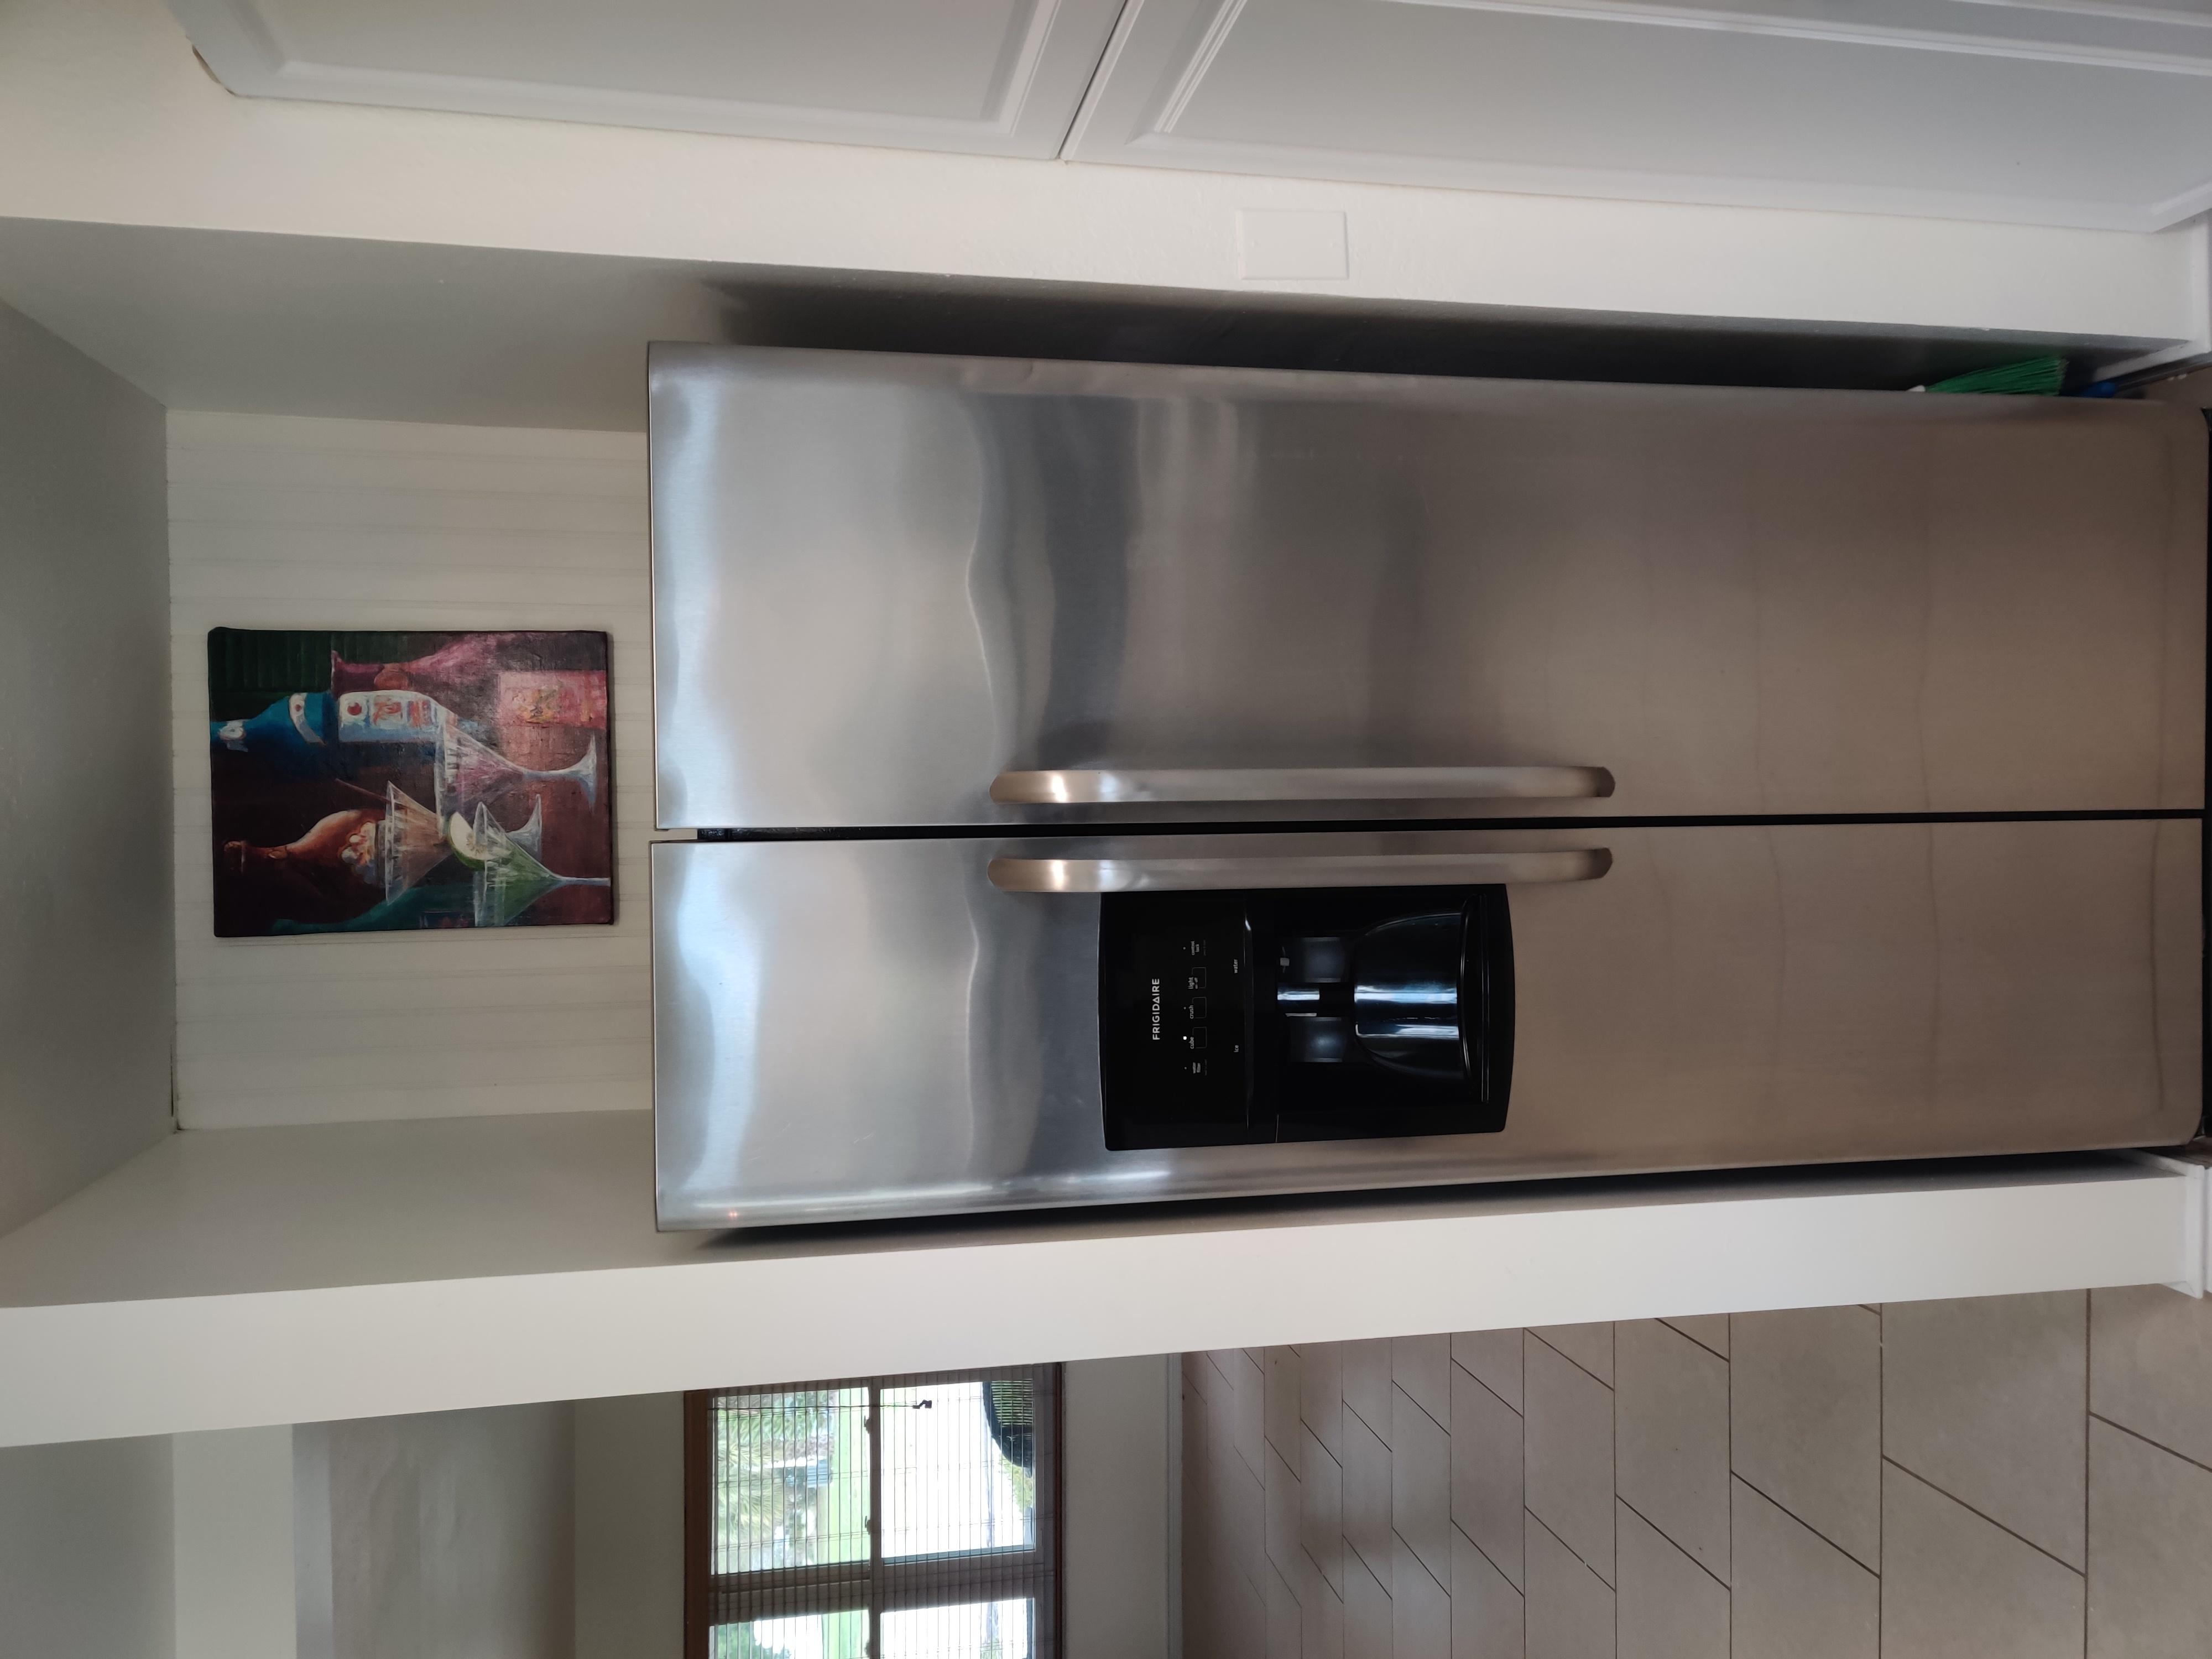 Full Sized Refrigerator